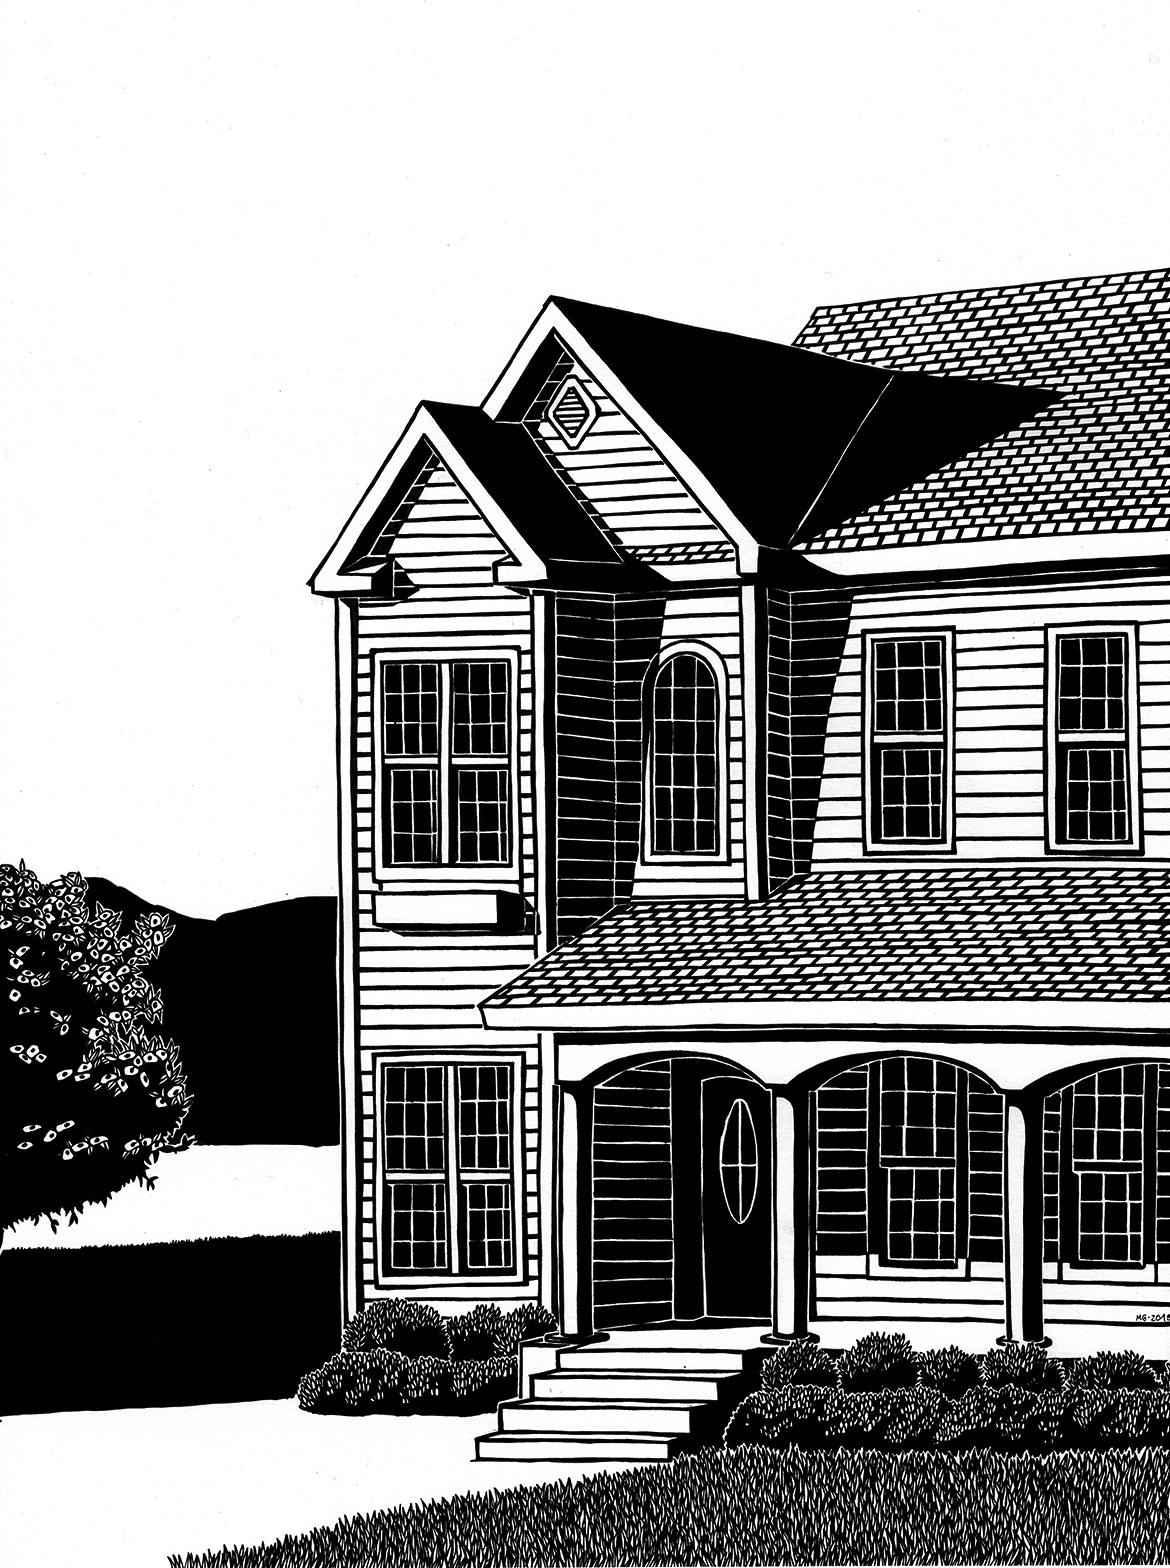 Single Family House #7